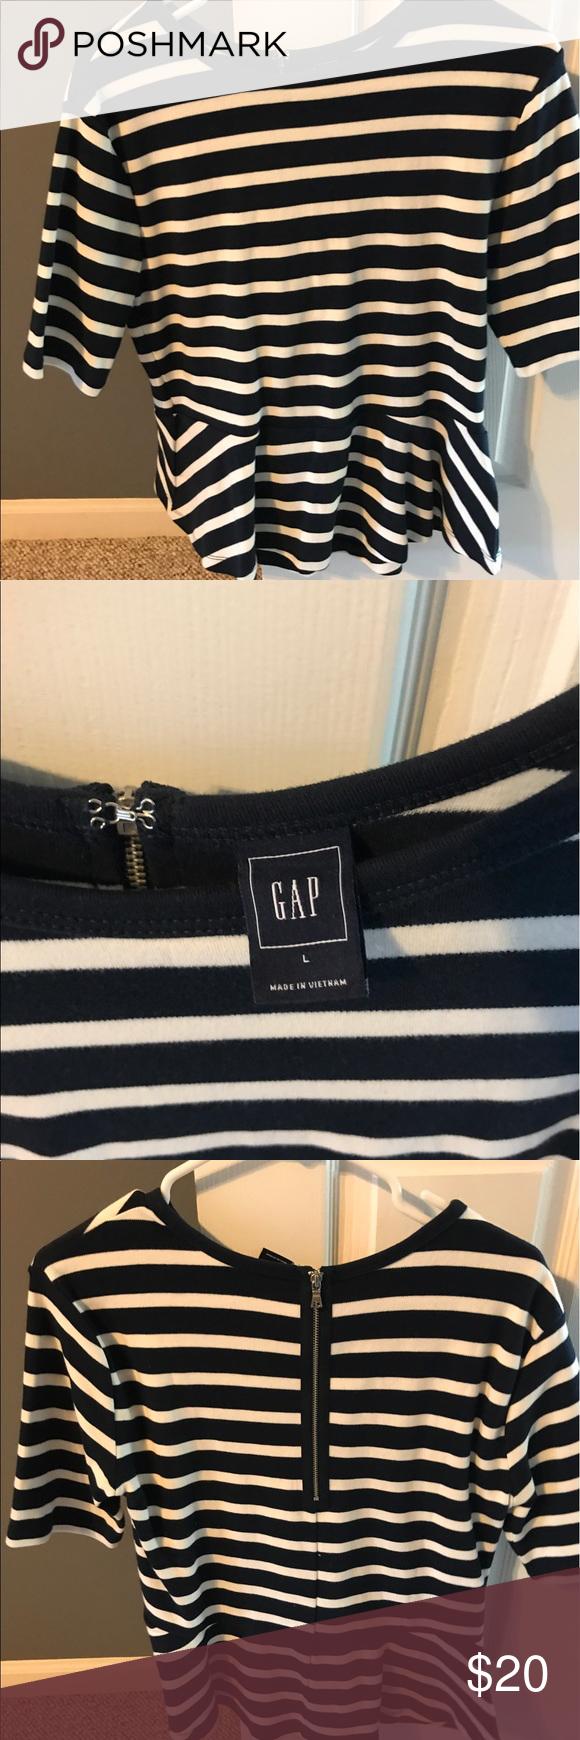 Women's gap large peplum top Women's gap large navy and white peplum top GAP Tops Blouses